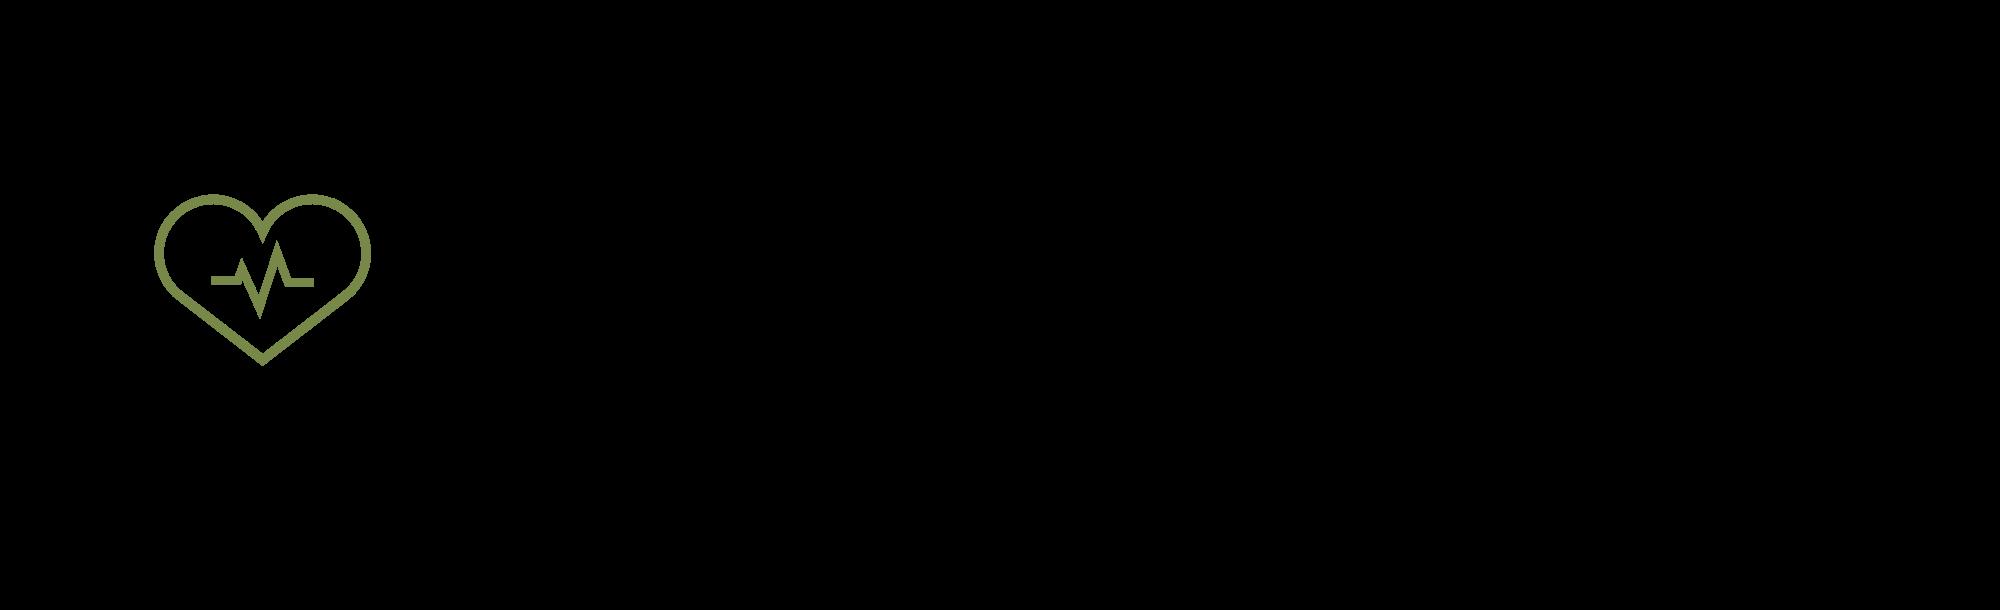 Evan Brand-logo.png